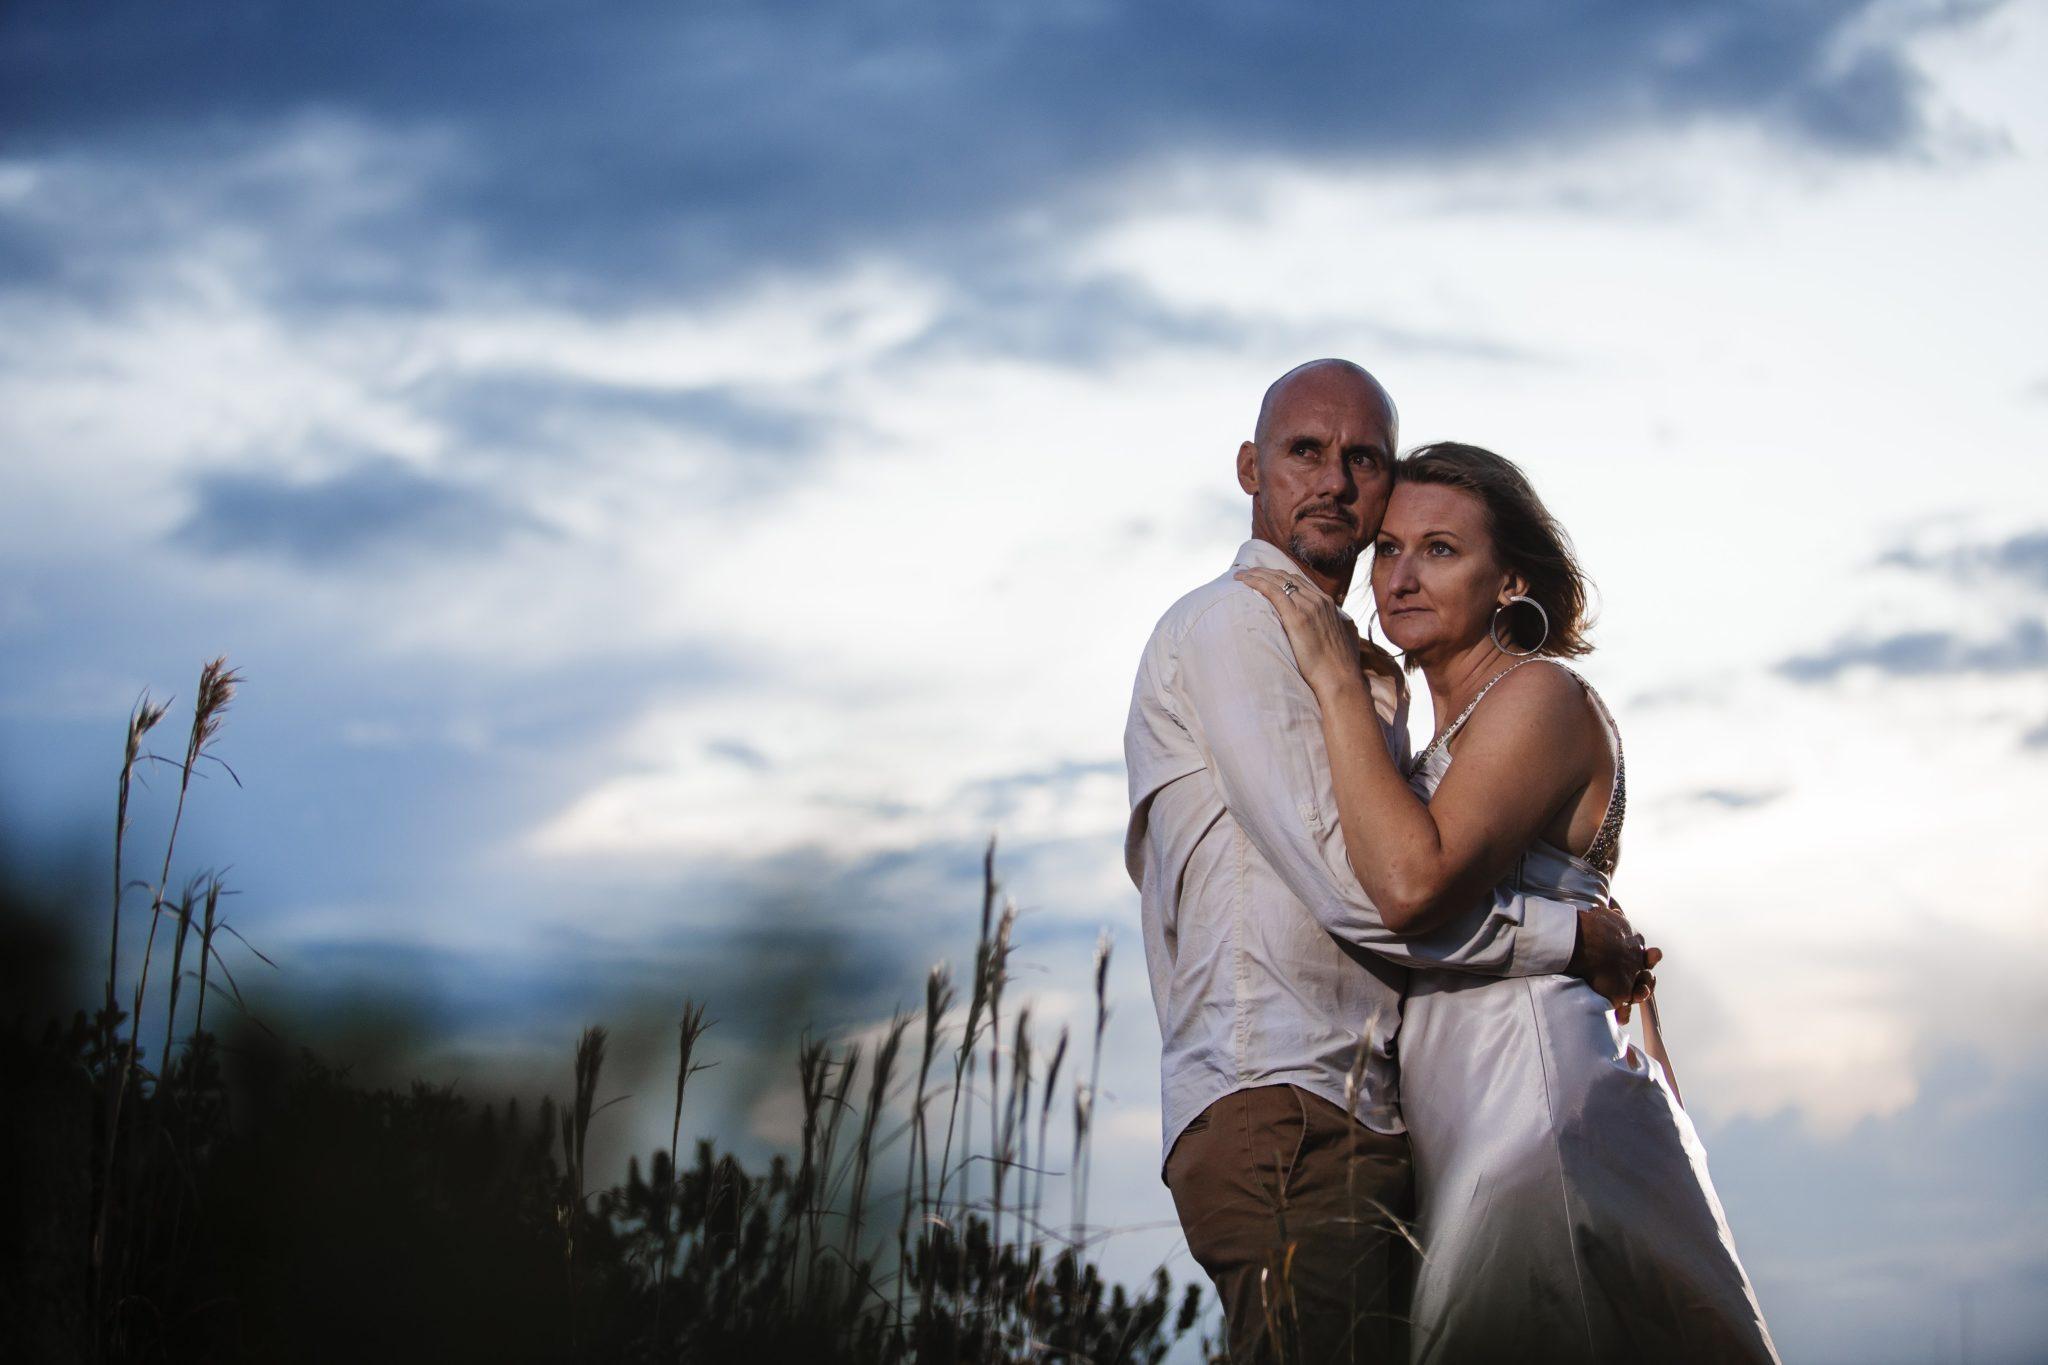 Couple's Lifestyle PhotoShoot in Mountain Pine Ridge, Belize